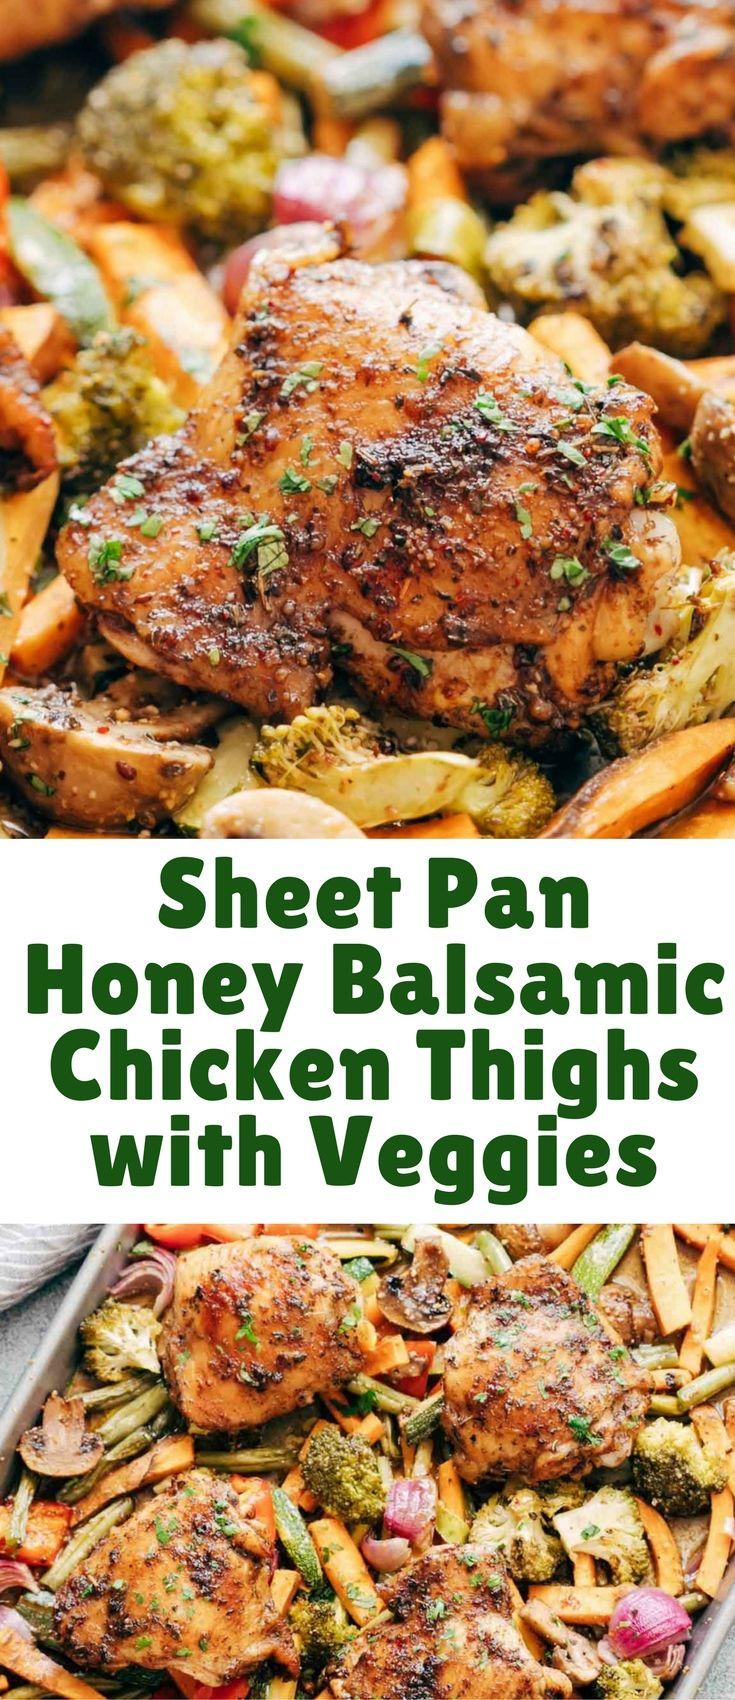 Best 25 Honey Balsamic Chicken Ideas On Pinterest -1616